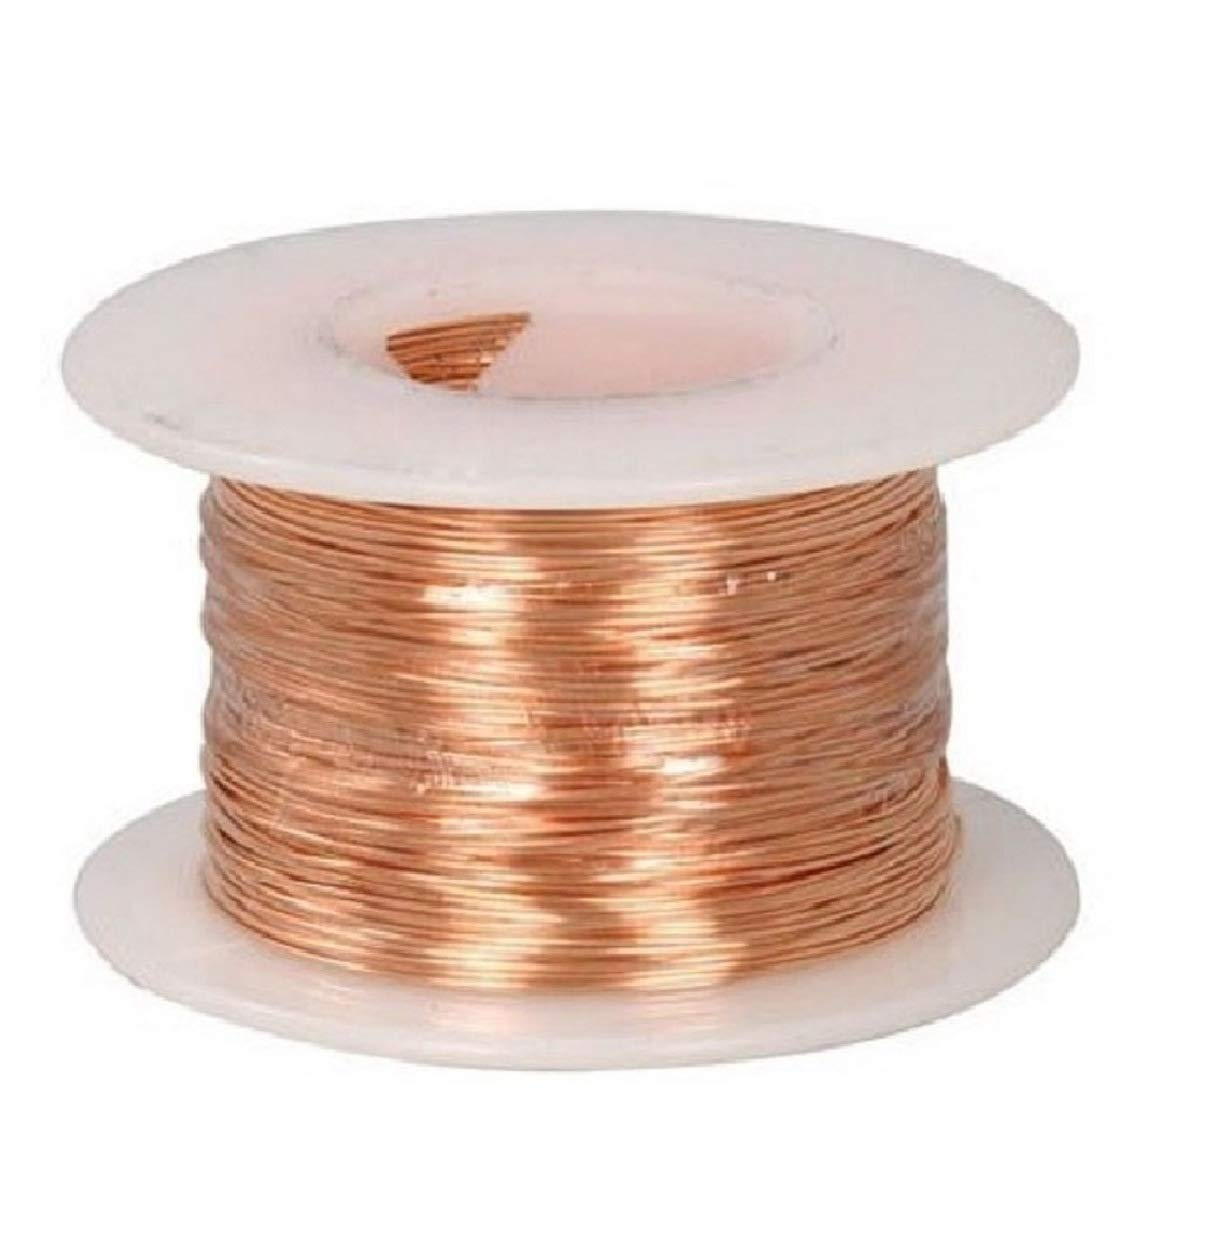 24 Ga Bare Copper Wire Genuine New York Mall Free Shipping 200 Ft Jewelry Ho Soft Dead Spool Making